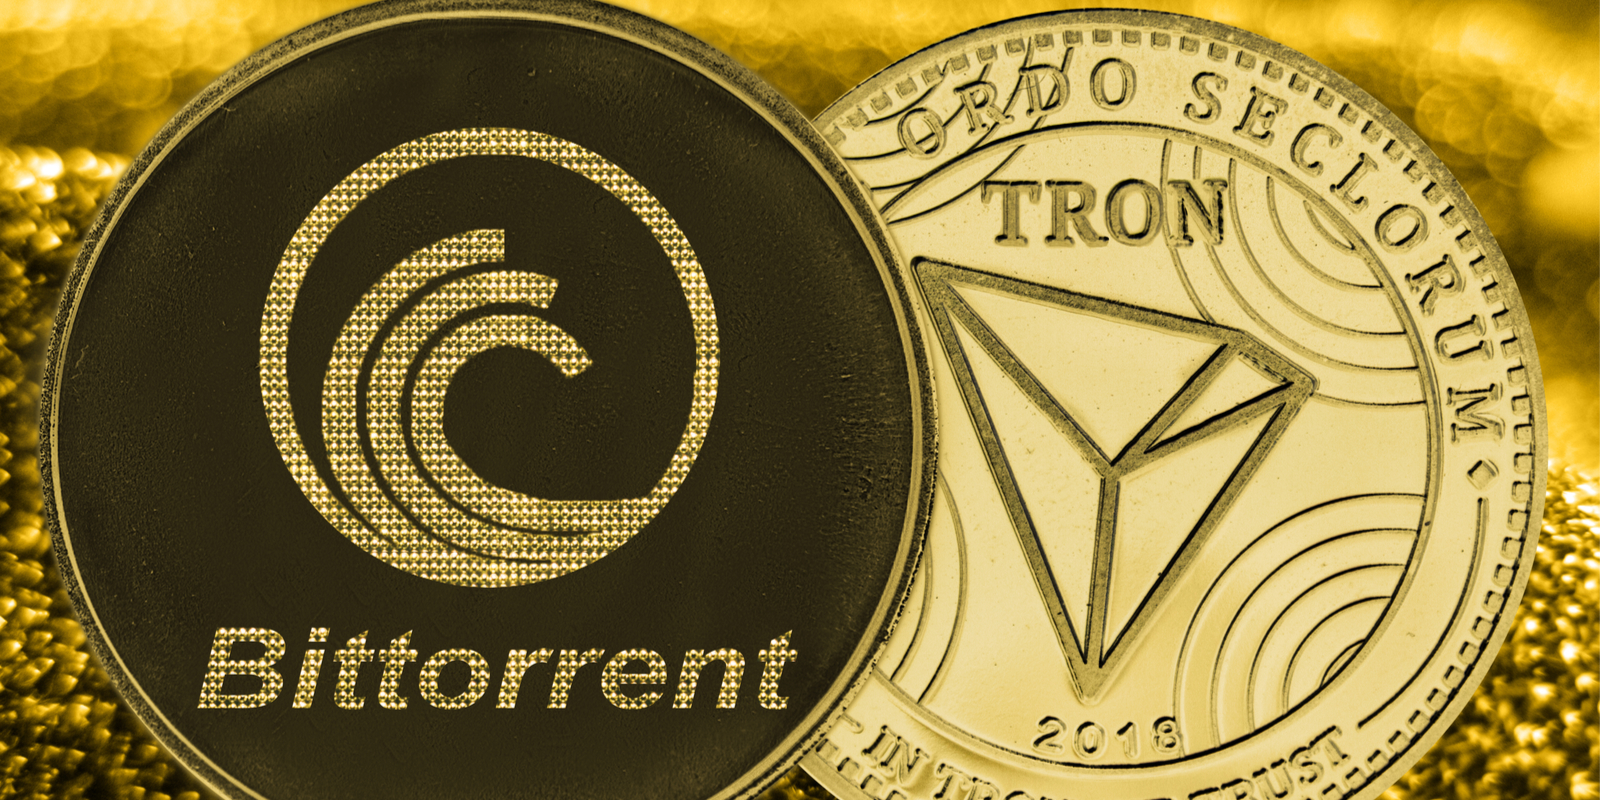 "Ethereum, Tron y EOS controlan el 98% de All Dapp Volumen ""ancho ="" 1600 ""altura ="" 800 ""srcset ="" https://blackswanfinances.com/wp-content/uploads/2020/01/bittorrent.jpg 1600w, https://news.bitcoin.com/ wp-content / uploads / 2019/12 / bittorrent-300x150.jpg 300w, https://news.bitcoin.com/wp-content/uploads/2019/12/bittorrent-1024x512.jpg 1024w, https: // noticias. bitcoin.com/wp-content/uploads/2019/12/bittorrent-768x384.jpg 768w, https://news.bitcoin.com/wp-content/uploads/2019/12/bittorrent-1536x768.jpg 1536w, https: //news.bitcoin.com/wp-content/uploads/2019/12/bittorrent-696x348.jpg 696w, https://news.bitcoin.com/wp-content/uploads/2019/12/bittorrent-1392x696.jpg 1392w, https://news.bitcoin.com/wp-content/uploads/2019/12/bittorrent-1068x534.jpg 1068w, https://news.bitcoin.com/wp-content /uploads/2019/12/bittorrent-840x420.jpg 840w ""tamaños ="" (ancho máximo: 1600px) 100vw, 1600px"